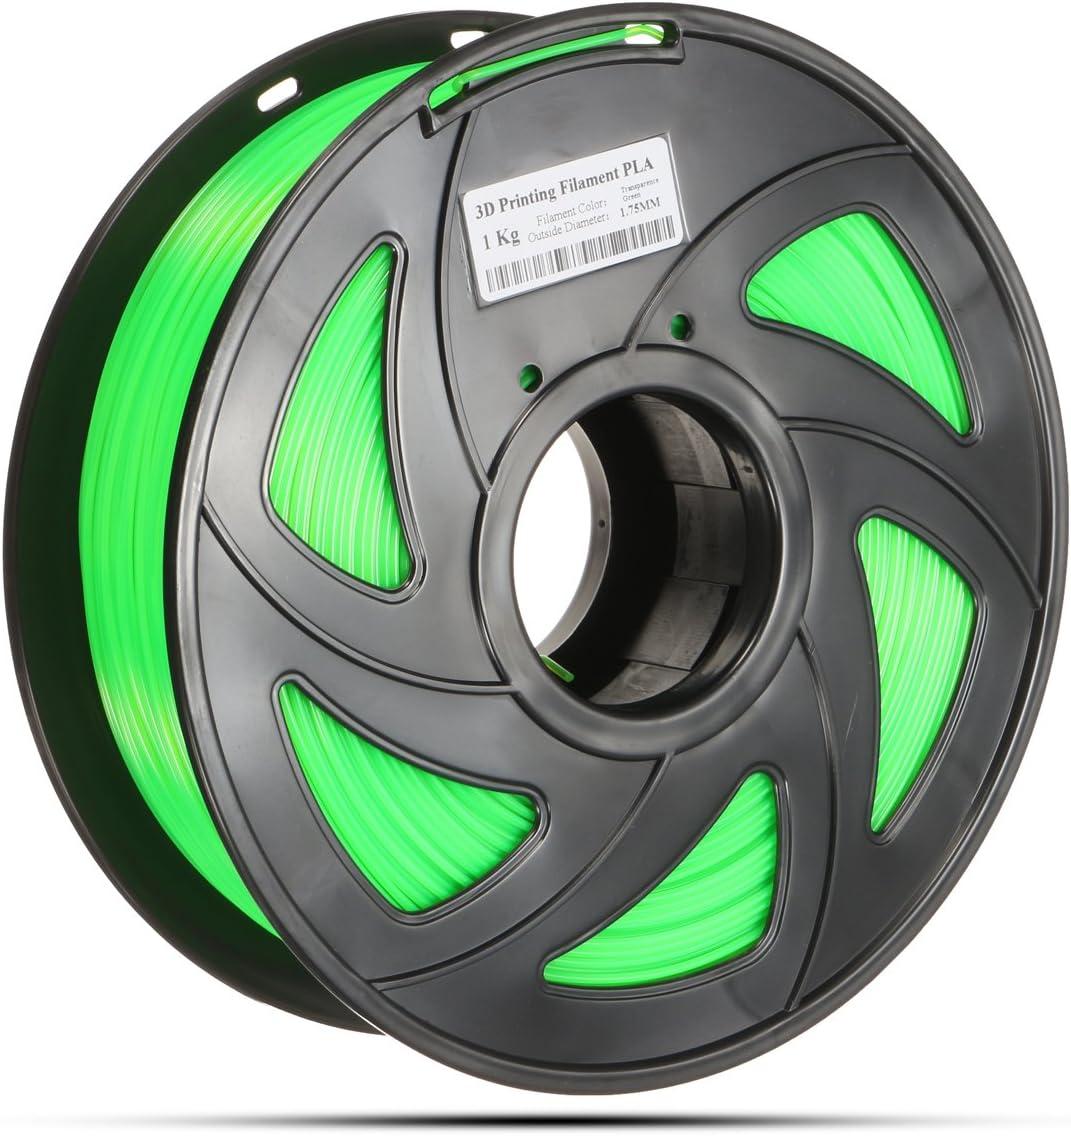 MASUNN 1.75Mm 1Kg Pla Transparant Rood/Blauw/Groen/Geel Filament Voor 3D Printer Reprap Groen